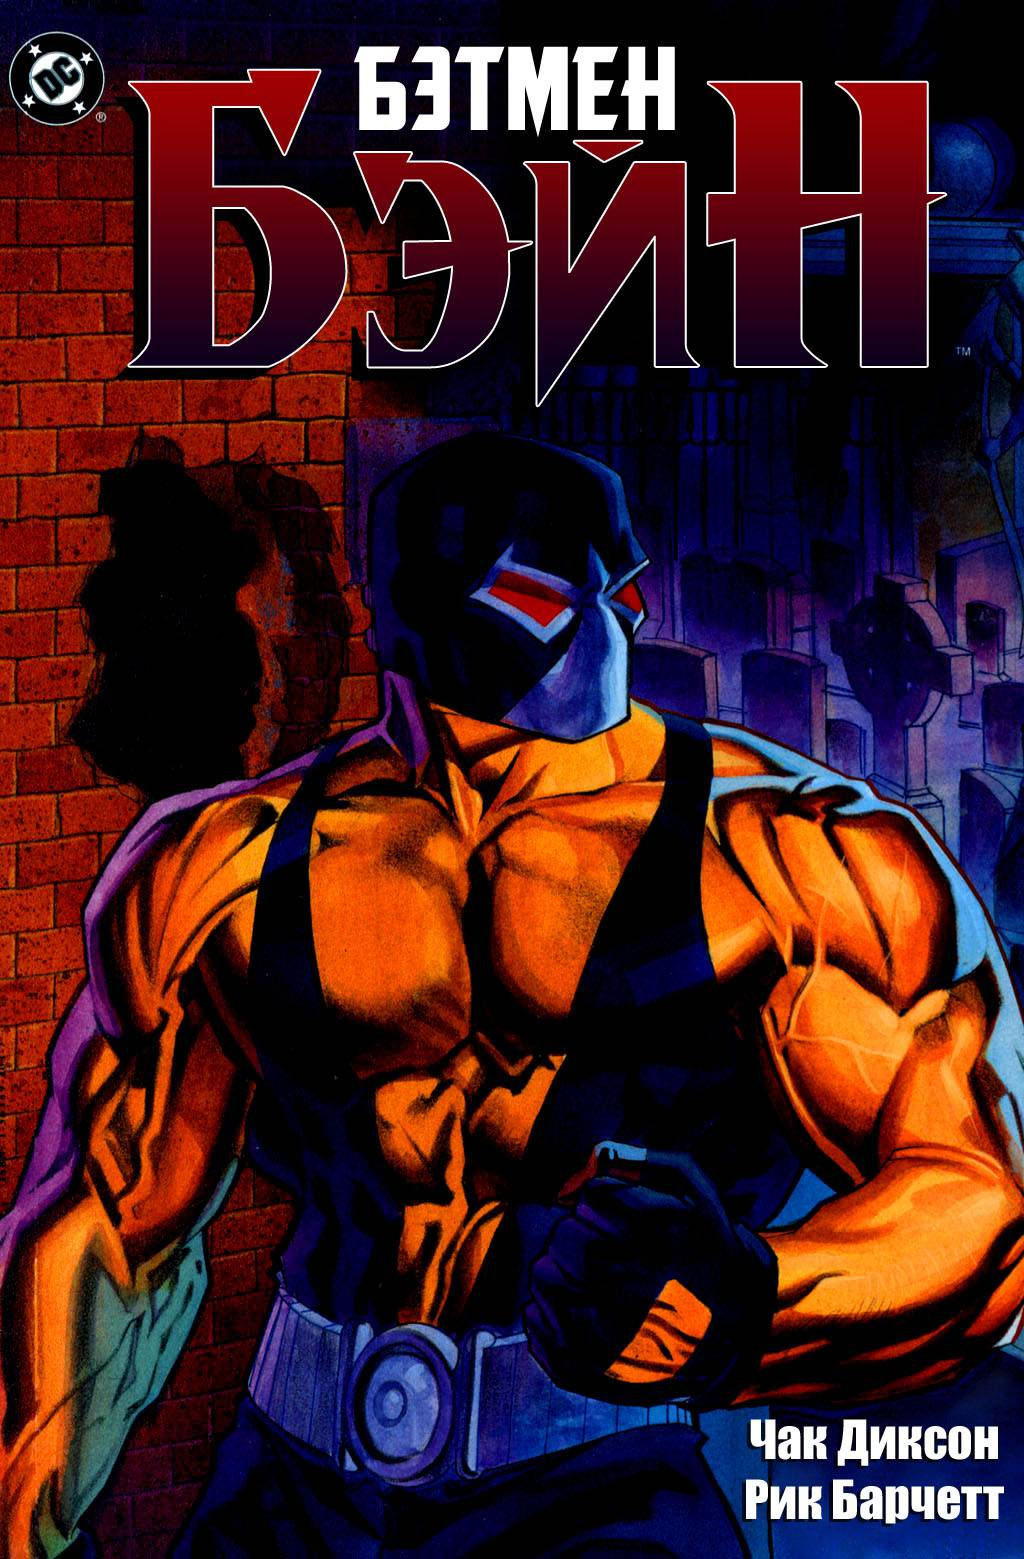 Бэтмен: Бэйн онлайн